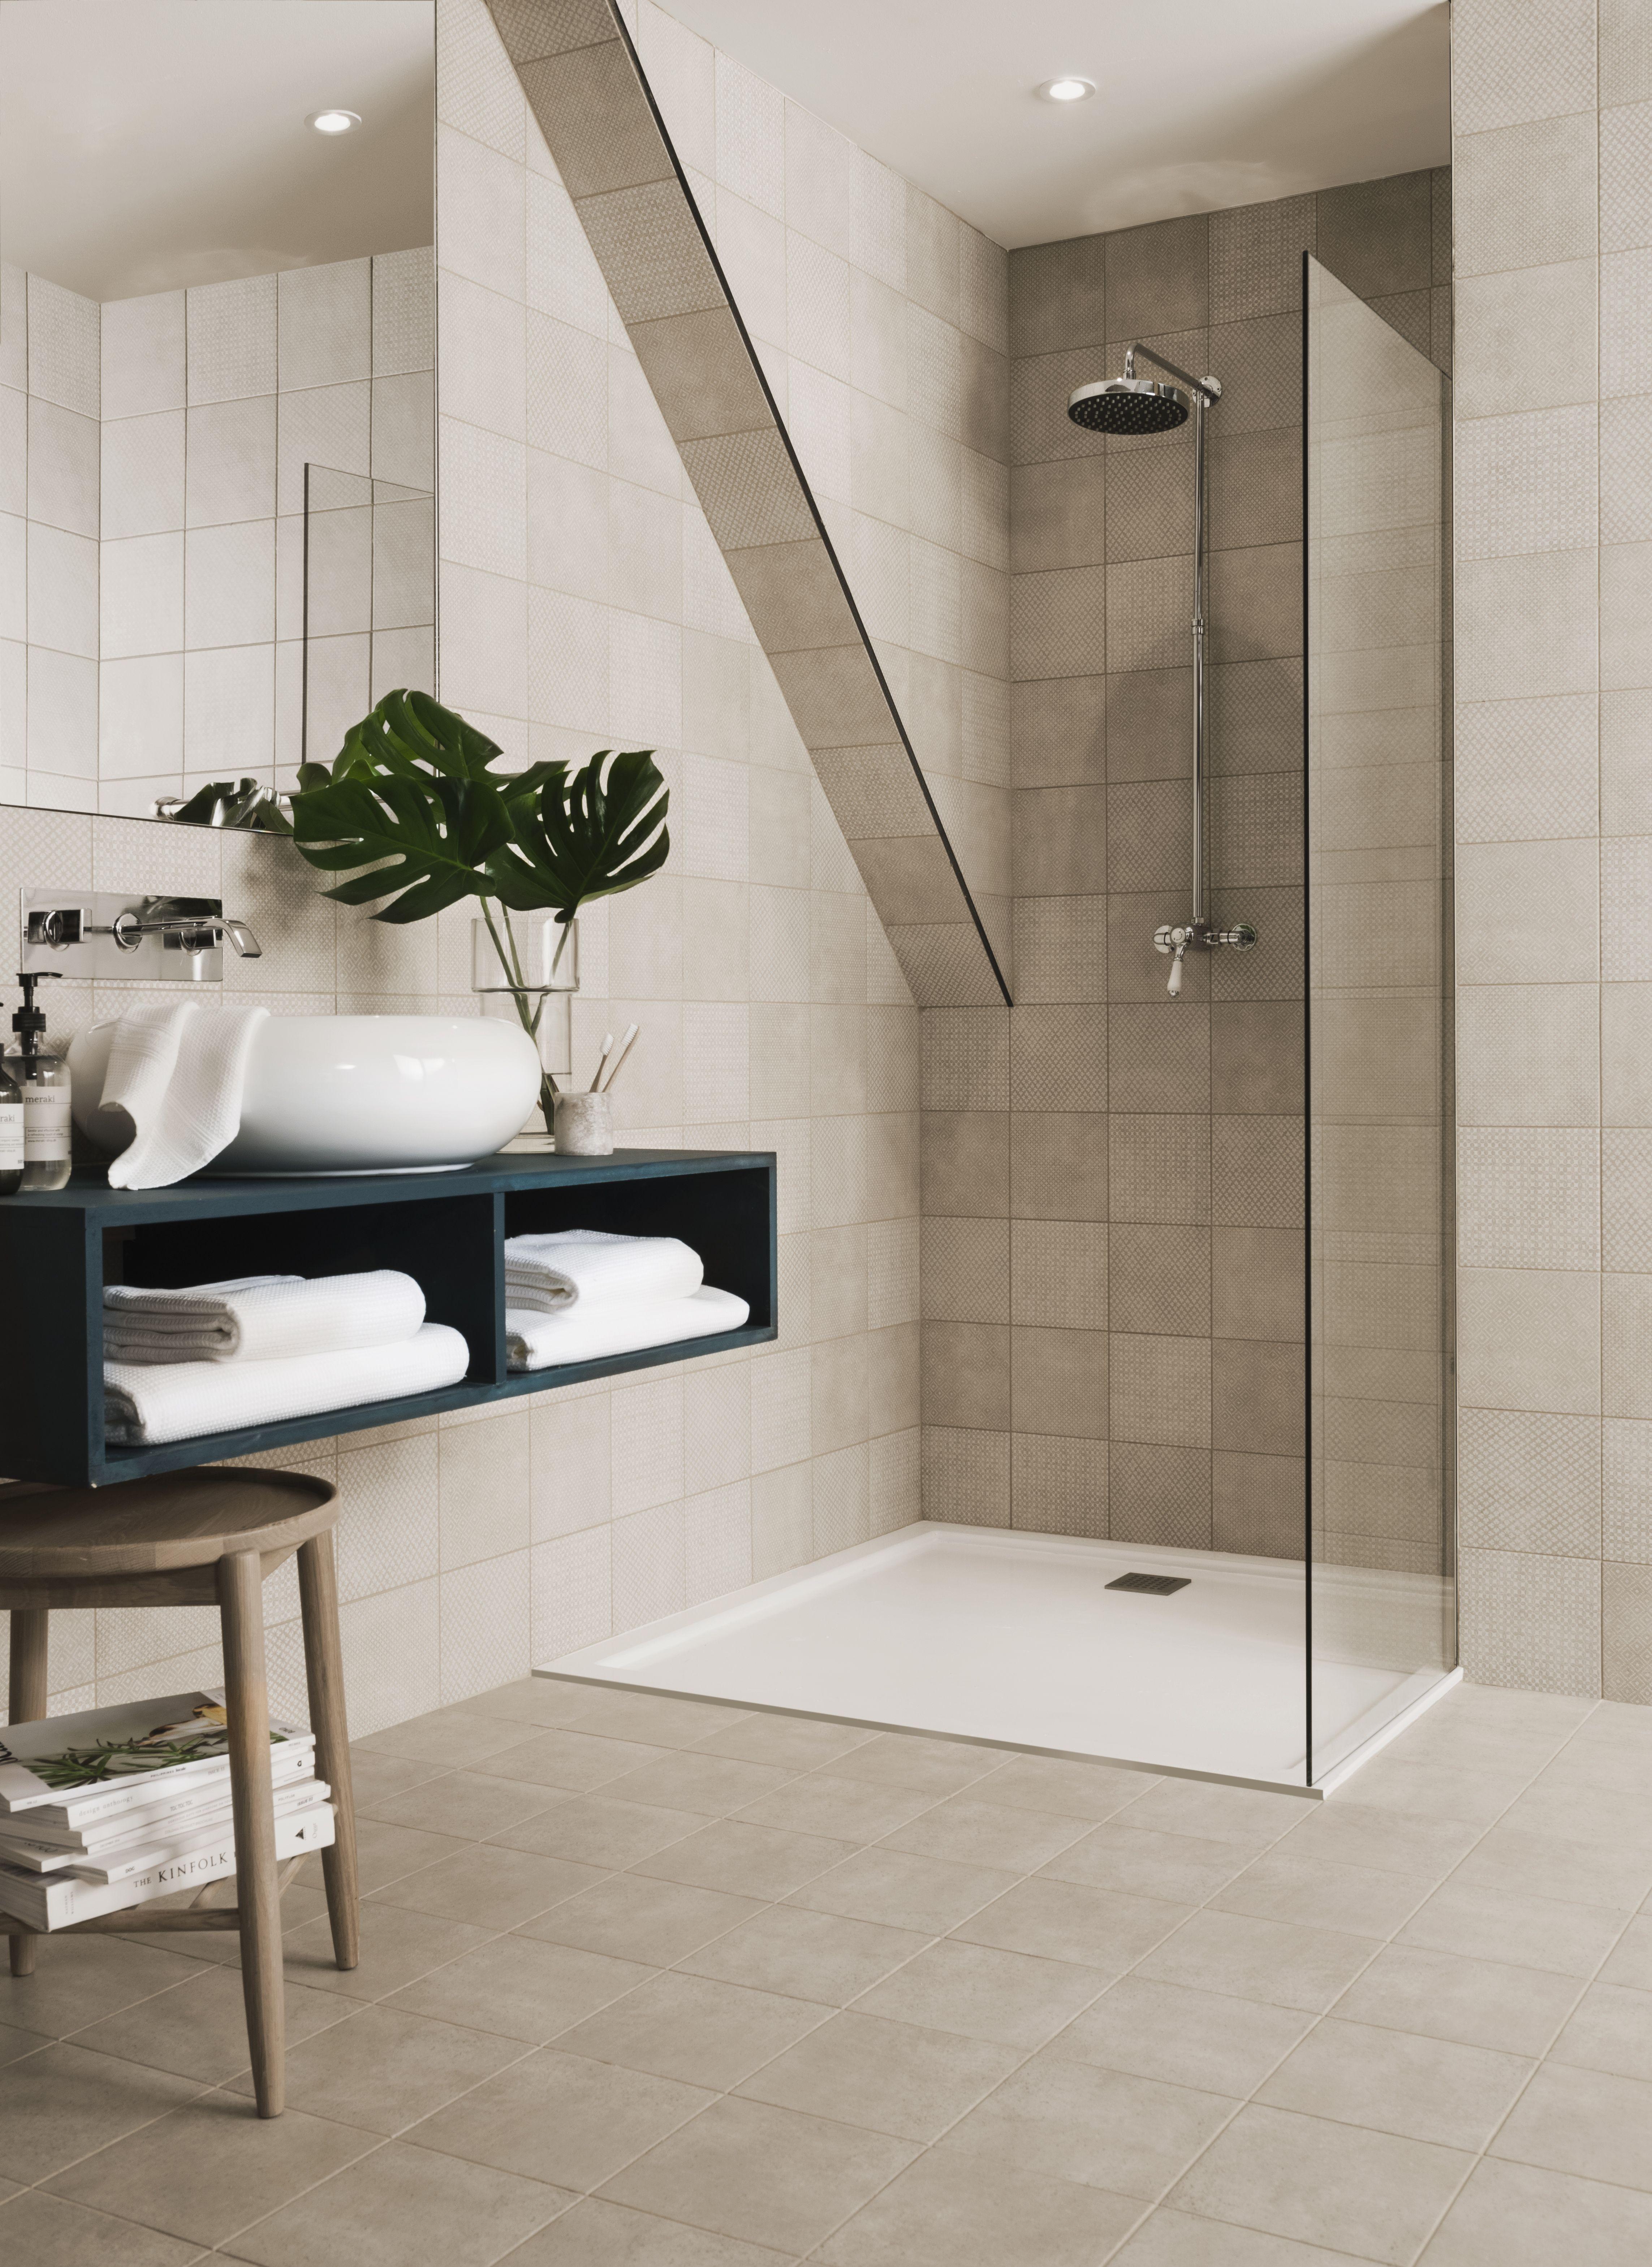 12 Bathroom Floor Tile Ideas Best Bathroom Flooring Bathroom Floor Tiles Shower Tile